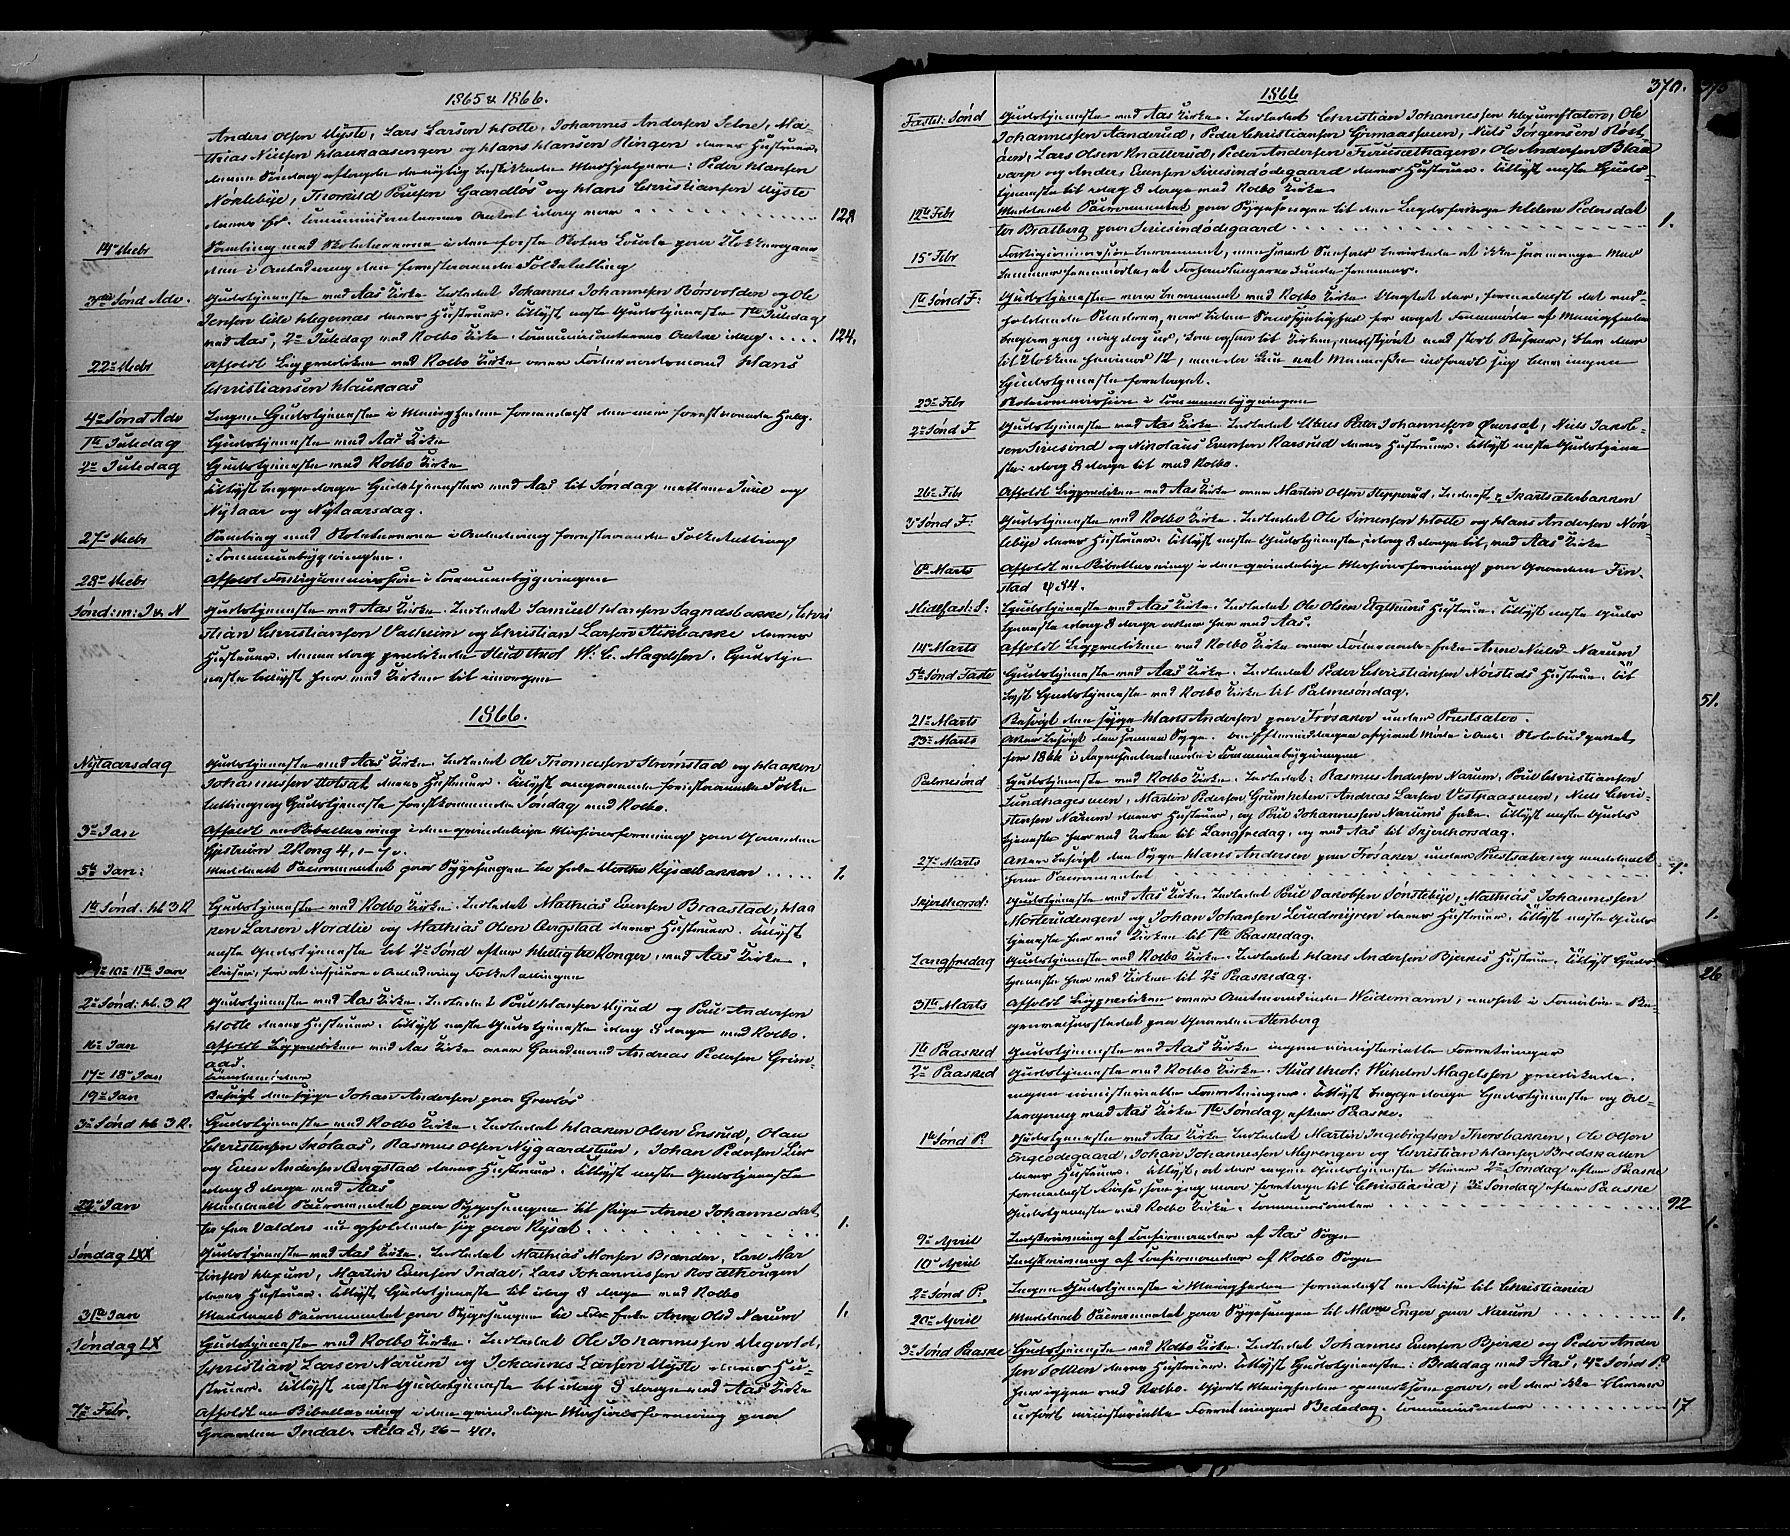 SAH, Vestre Toten prestekontor, H/Ha/Haa/L0007: Ministerialbok nr. 7, 1862-1869, s. 370